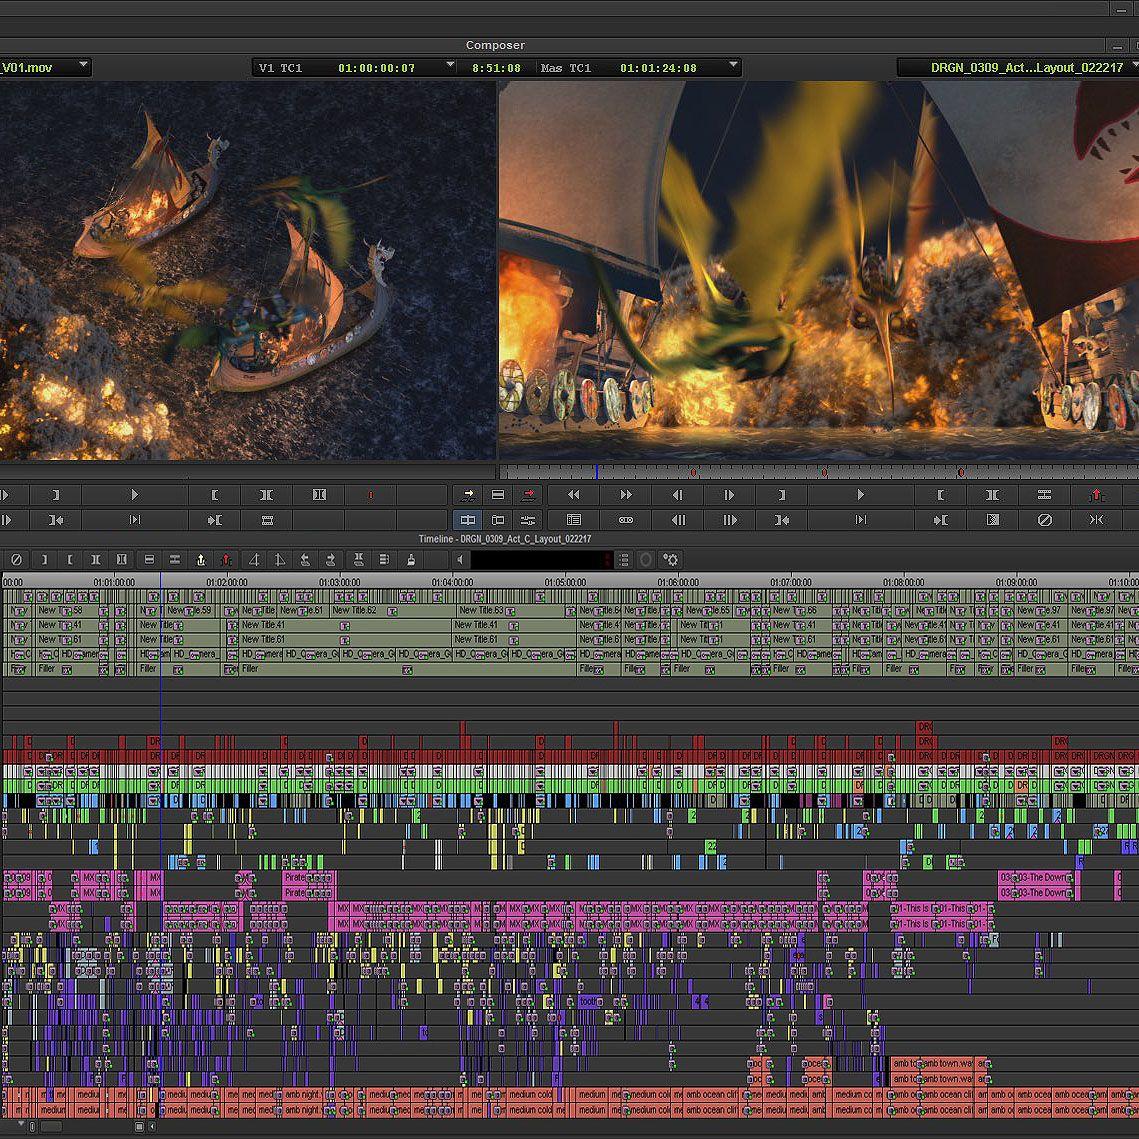 Timeline Dreamworks Dragons By Joel Fisher Dragons Animation Postproduction Mediacomposer Avid Video Editing Software Dreamworks Dragons Video Editing